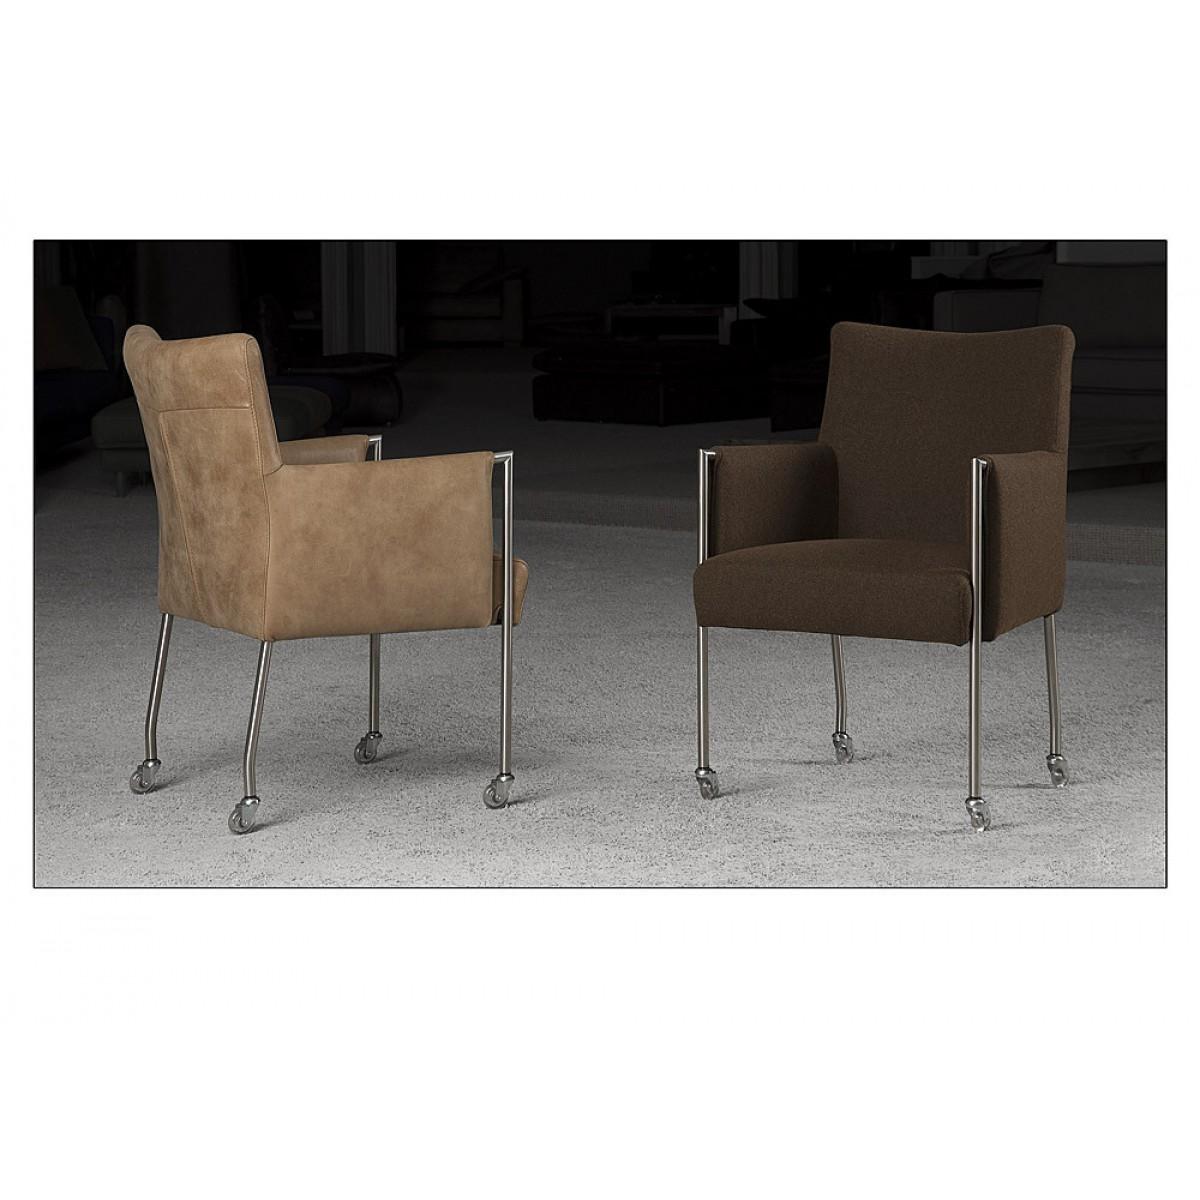 laura-armstoel-stoel-eetkamerstoel-op-wielen-africa-leder-het-anker